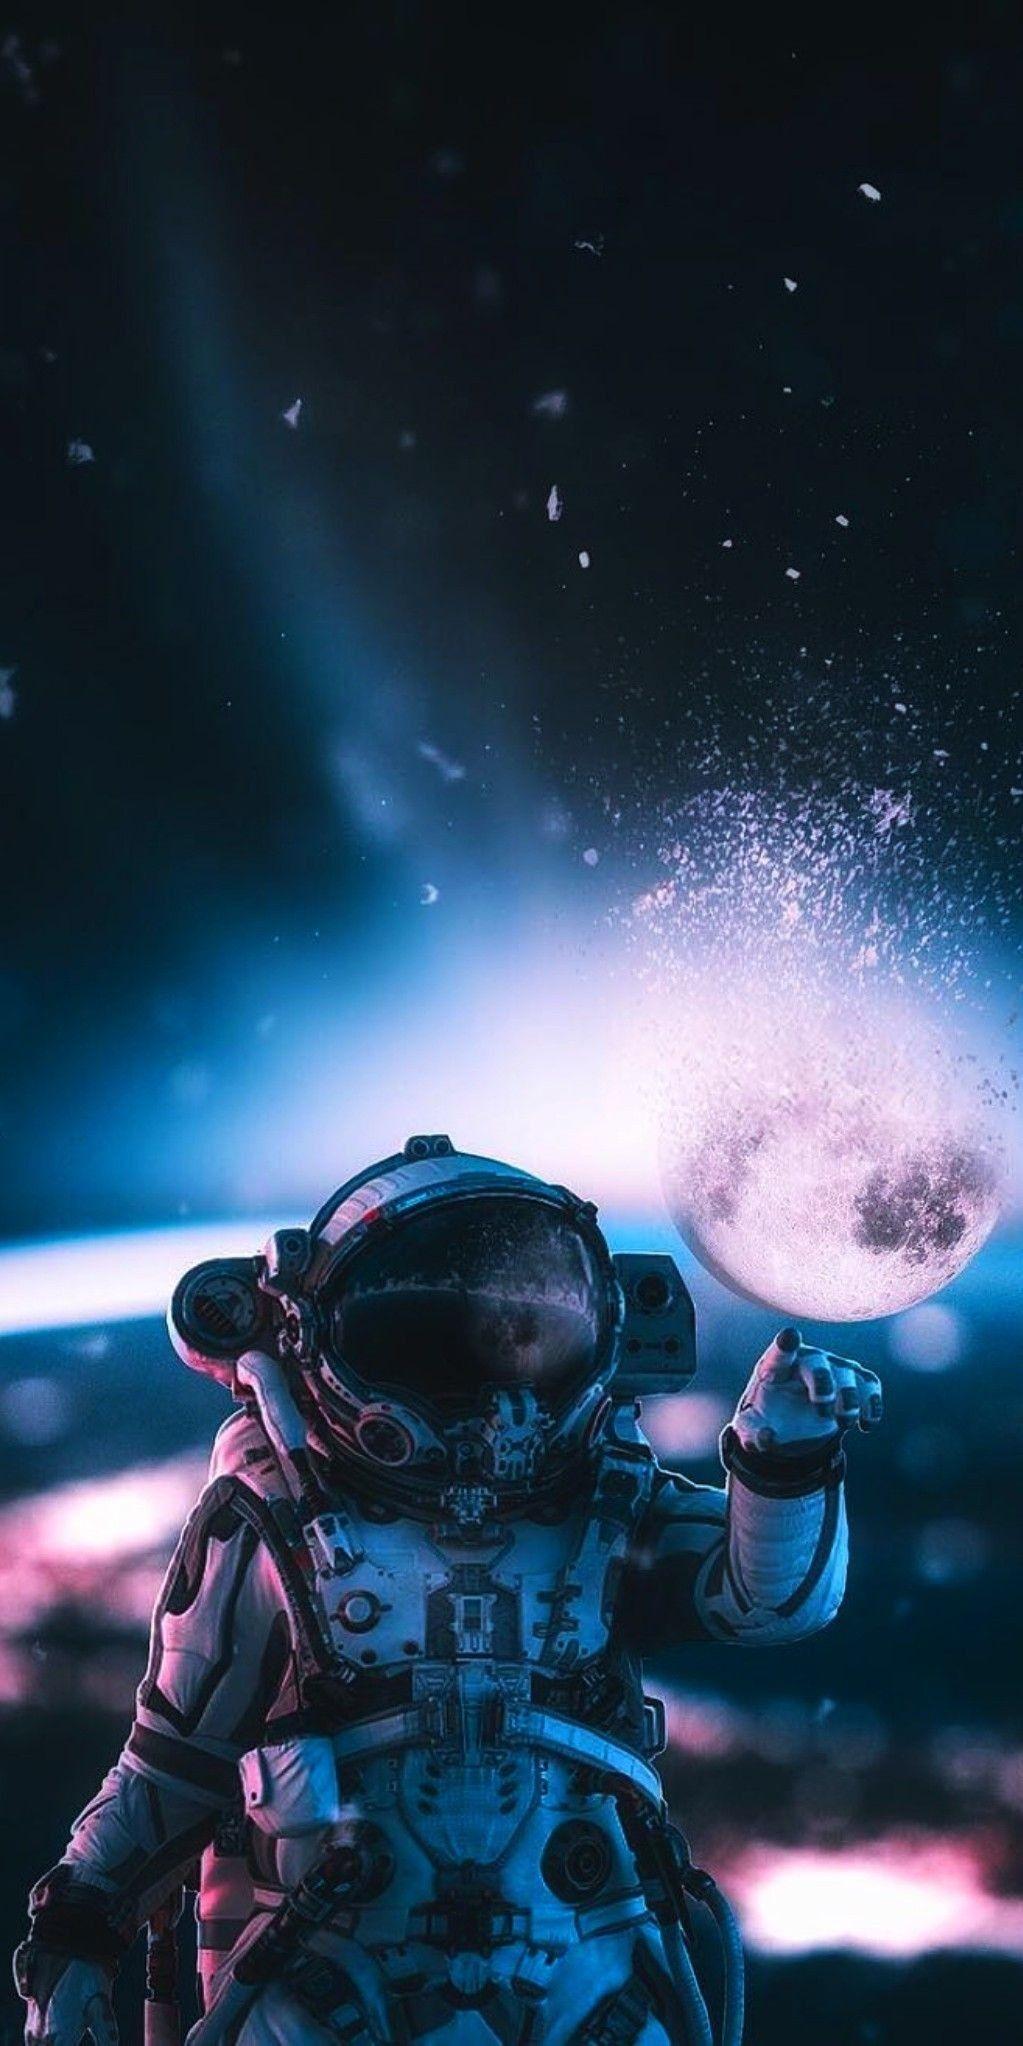 Pin By Tae On Arte Surrealista Astronaut Wallpaper Astronaut Art Space Art